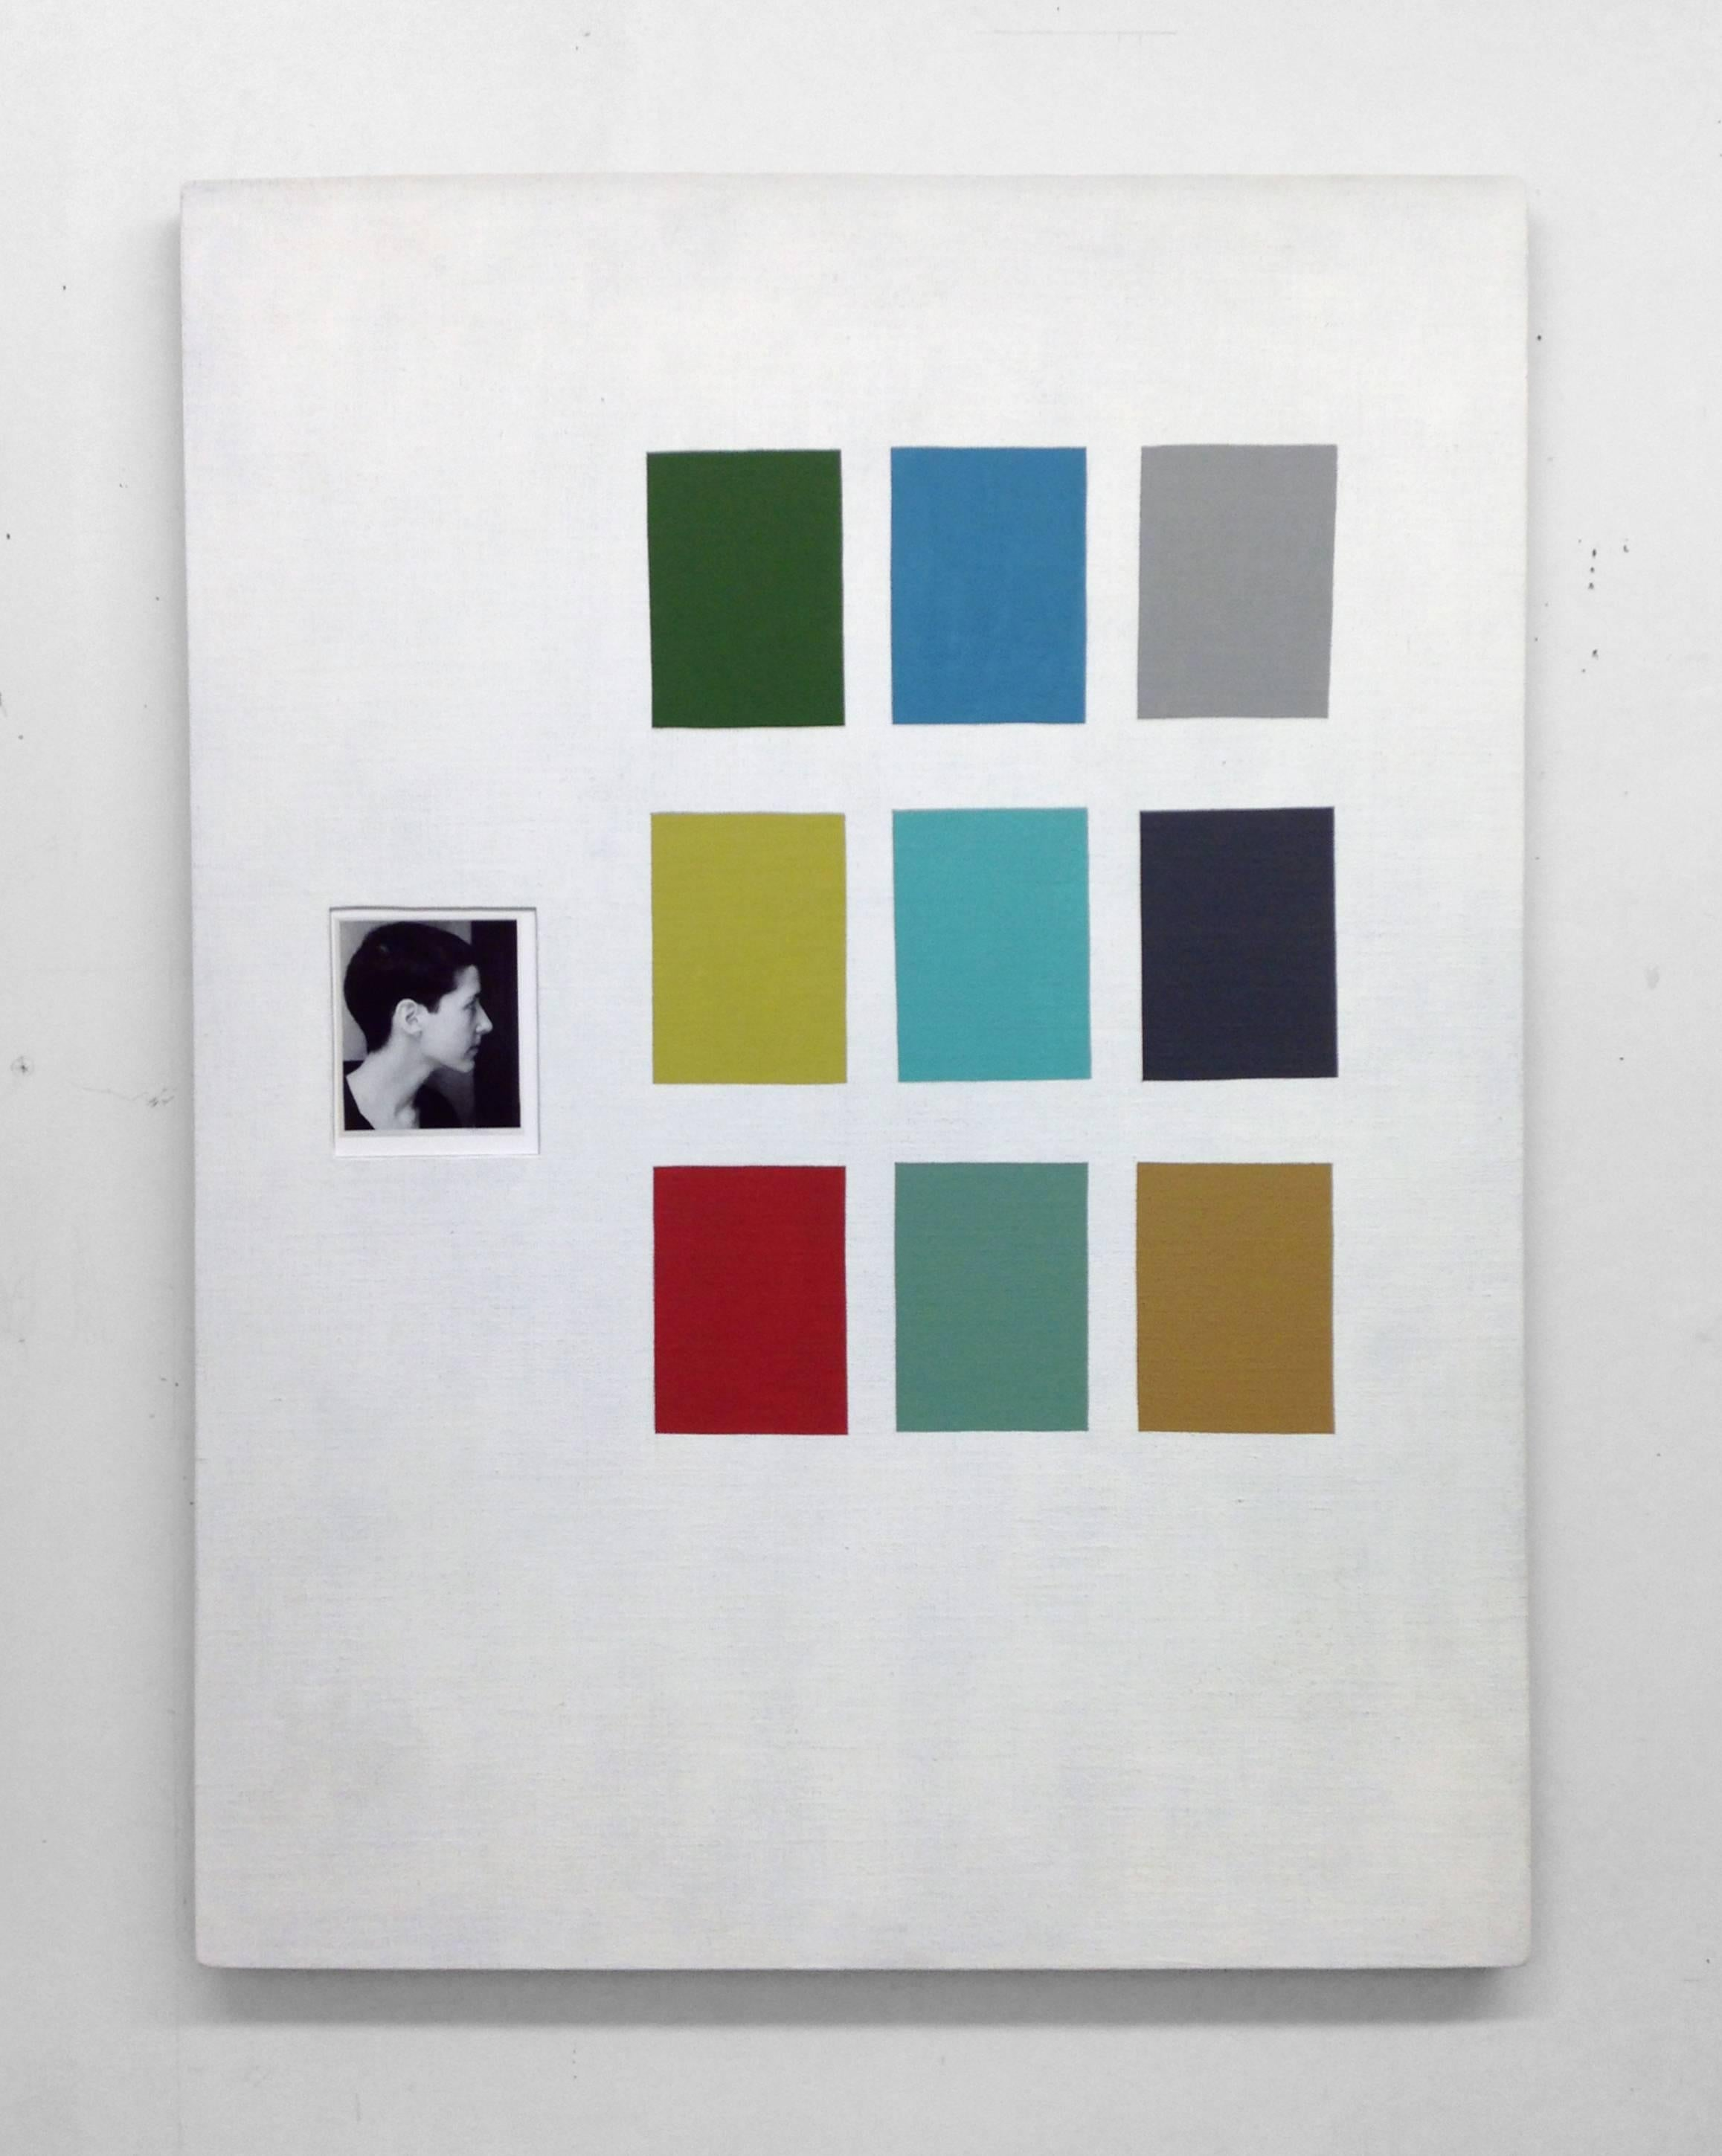 Ken Weathersby, 281, 2017, Linen, Acrylic Paint, Graphite